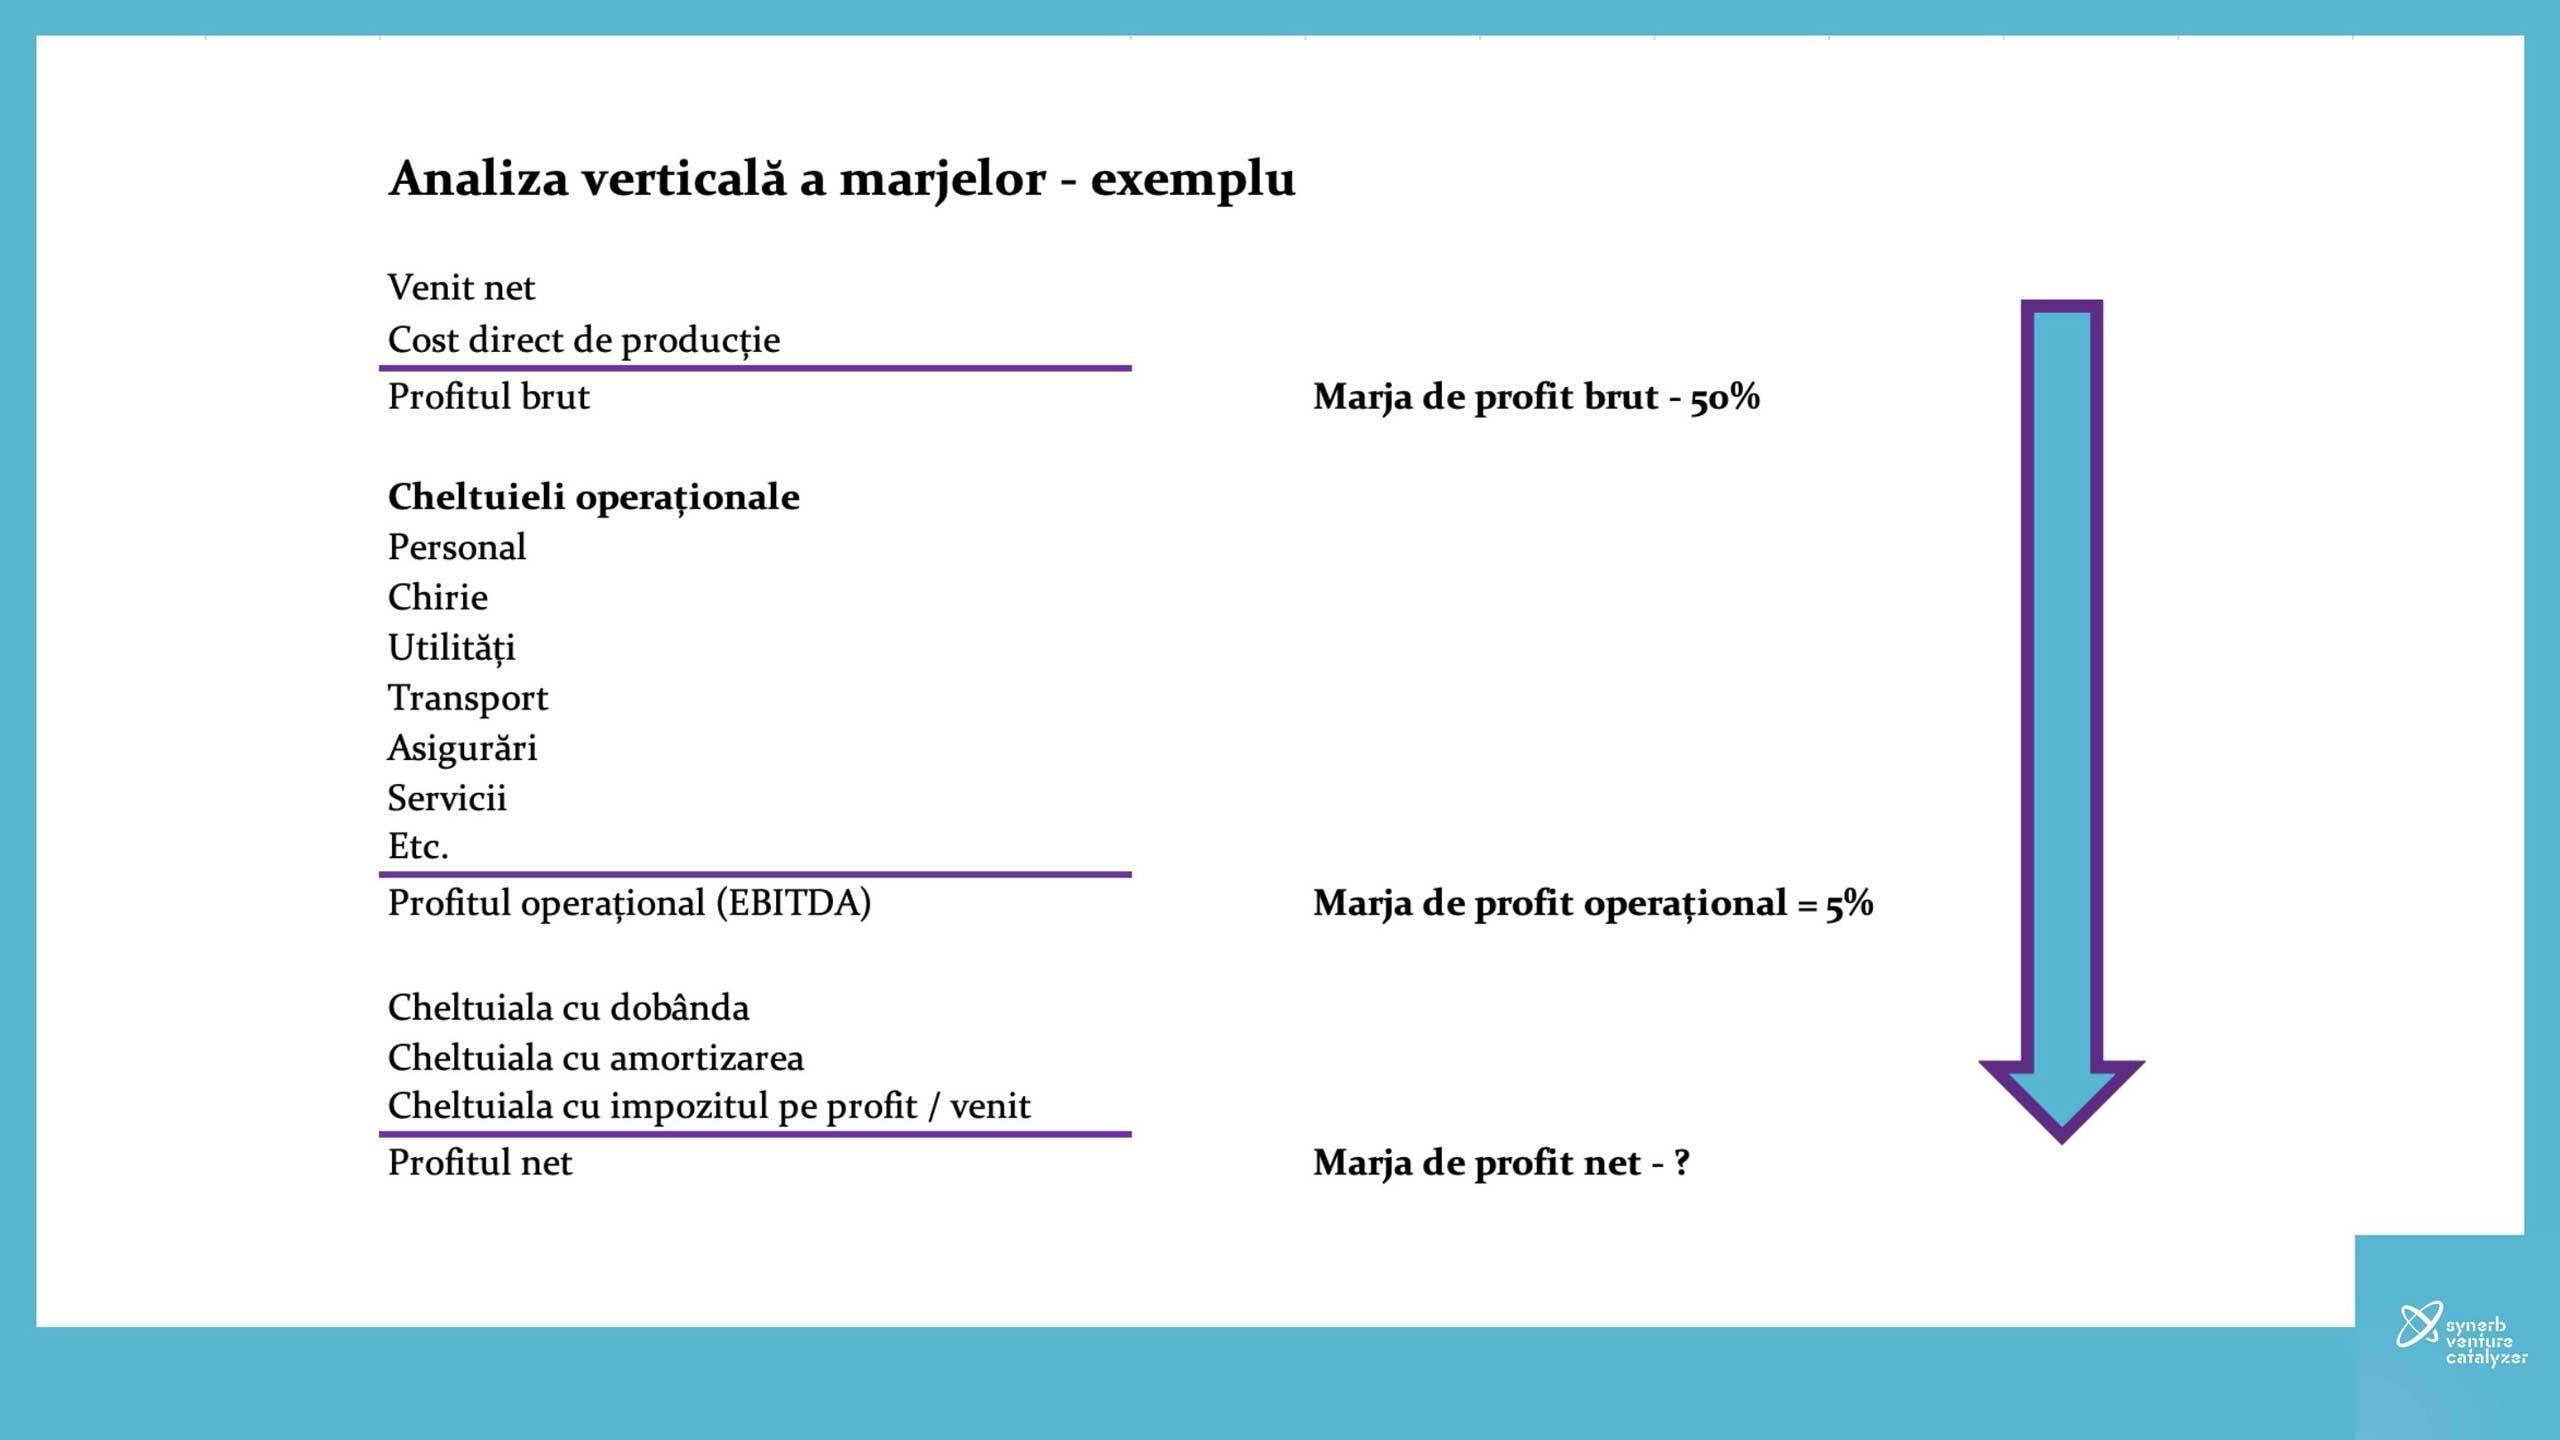 Synerb Analiza verticala marje